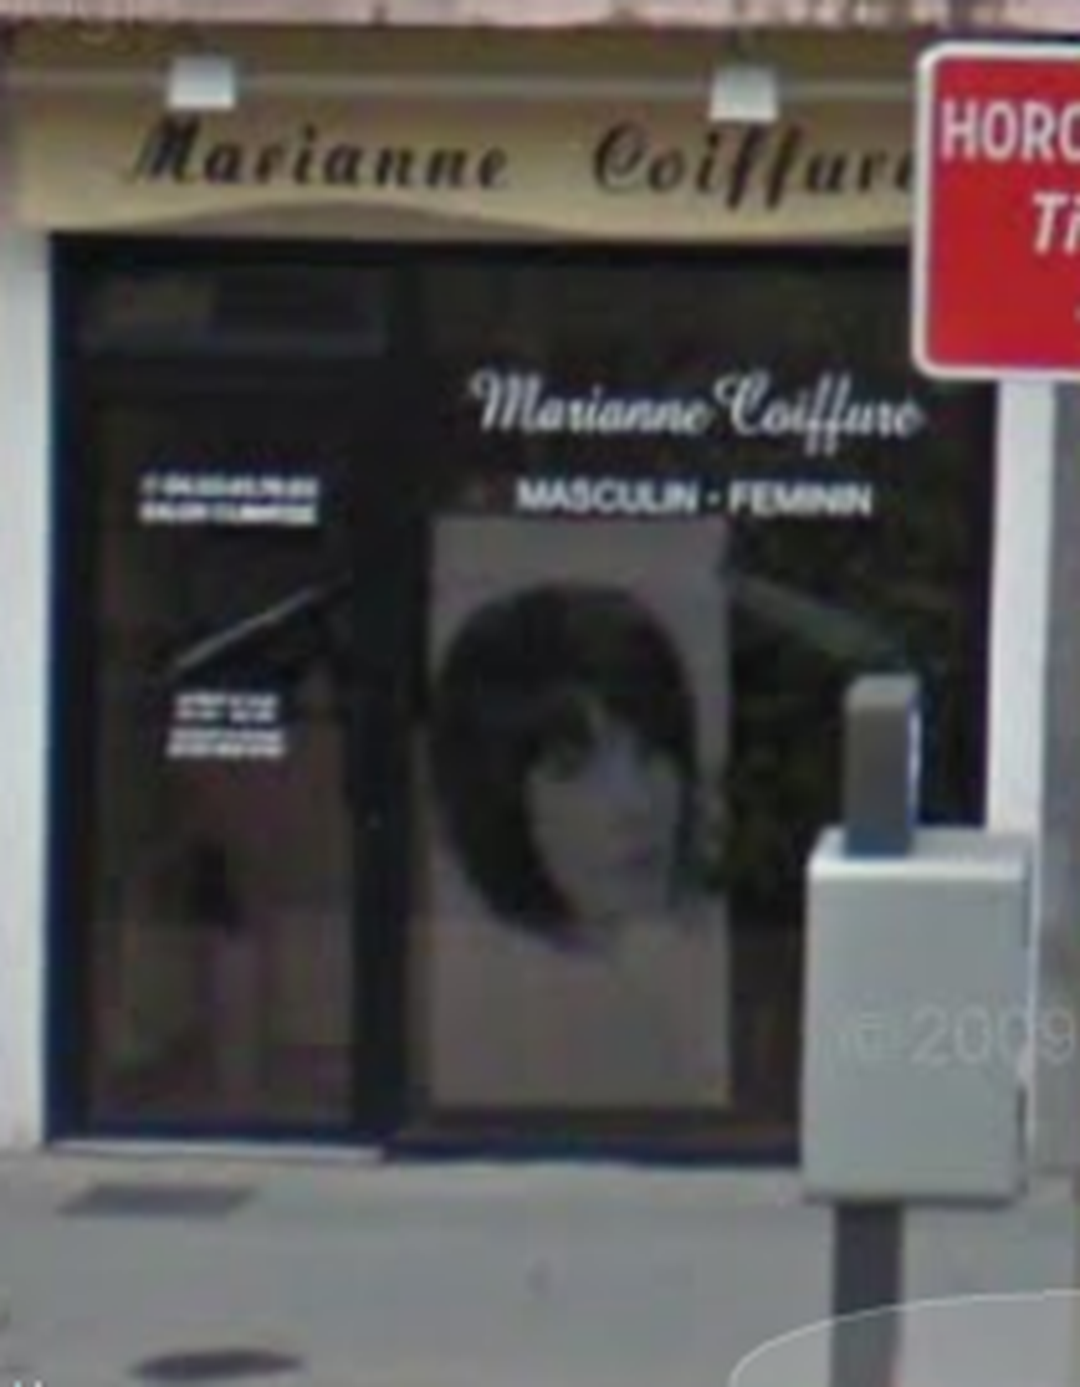 Foto del 5 de febrero de 2016 18:52, La Coupe Marianne Coiffure, 16 Avenue de Chambéry, 74000 Annecy, Francia